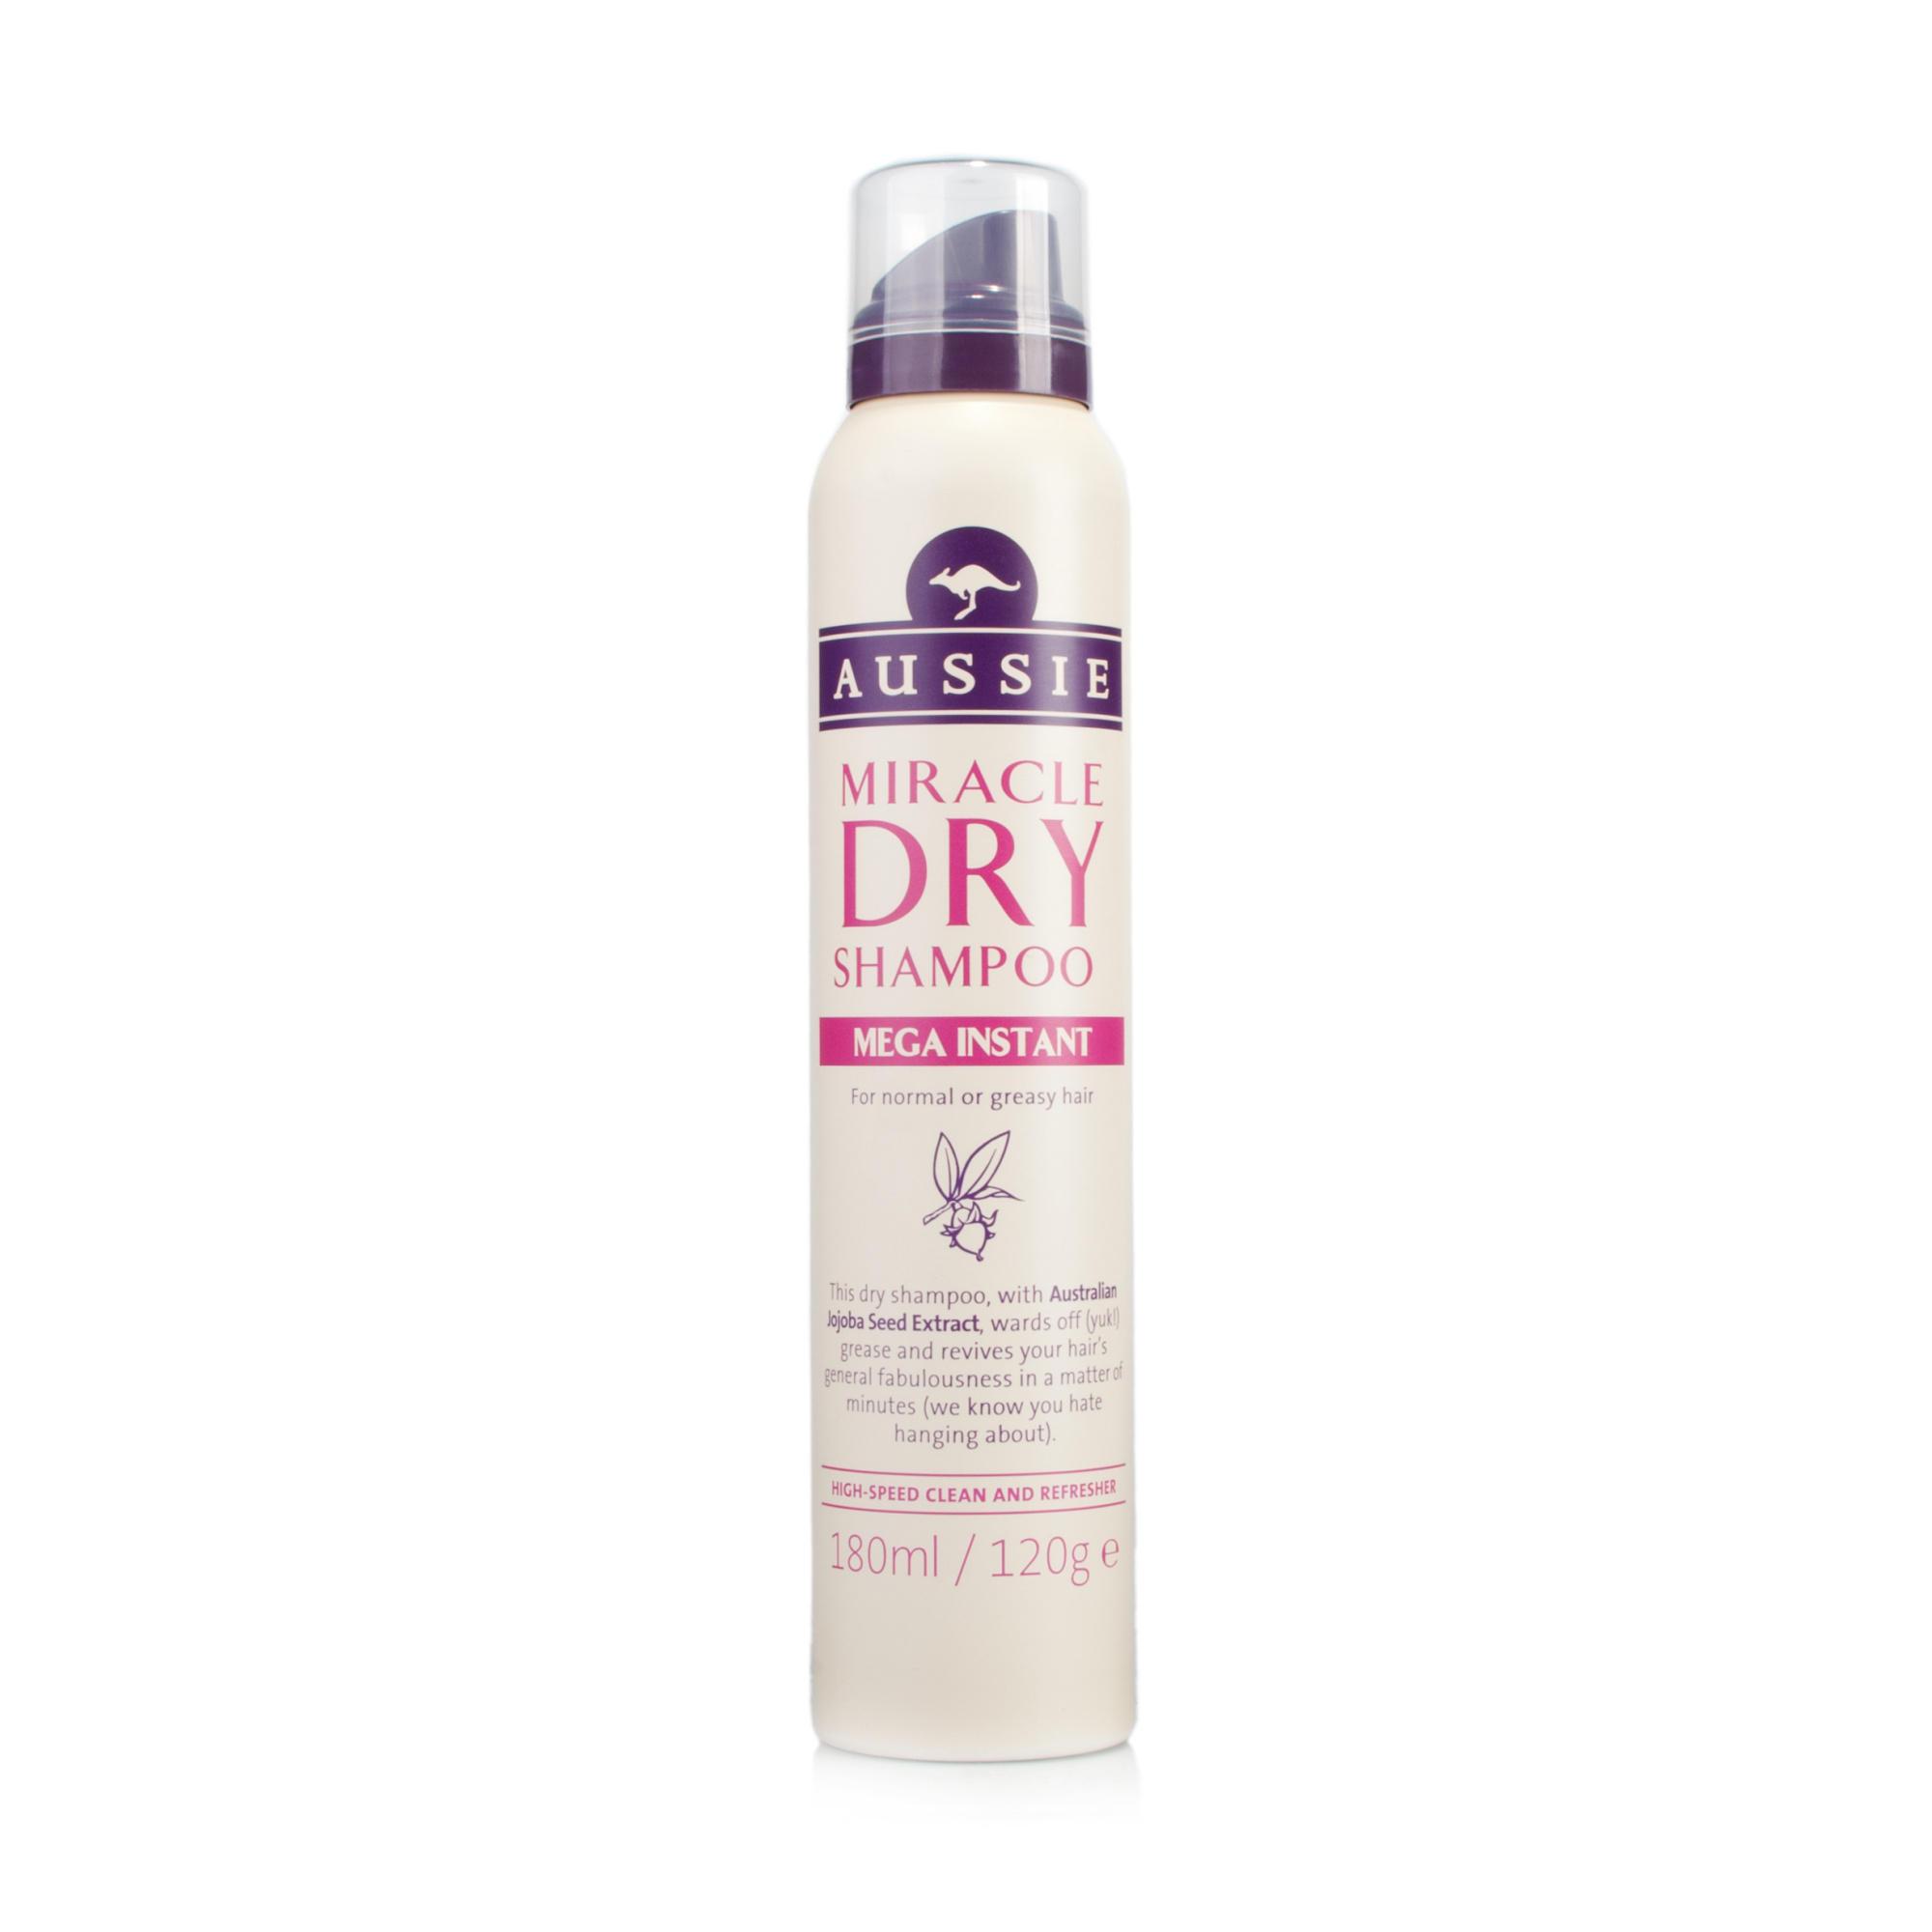 Aussie Dry Shampoo Mega Instant